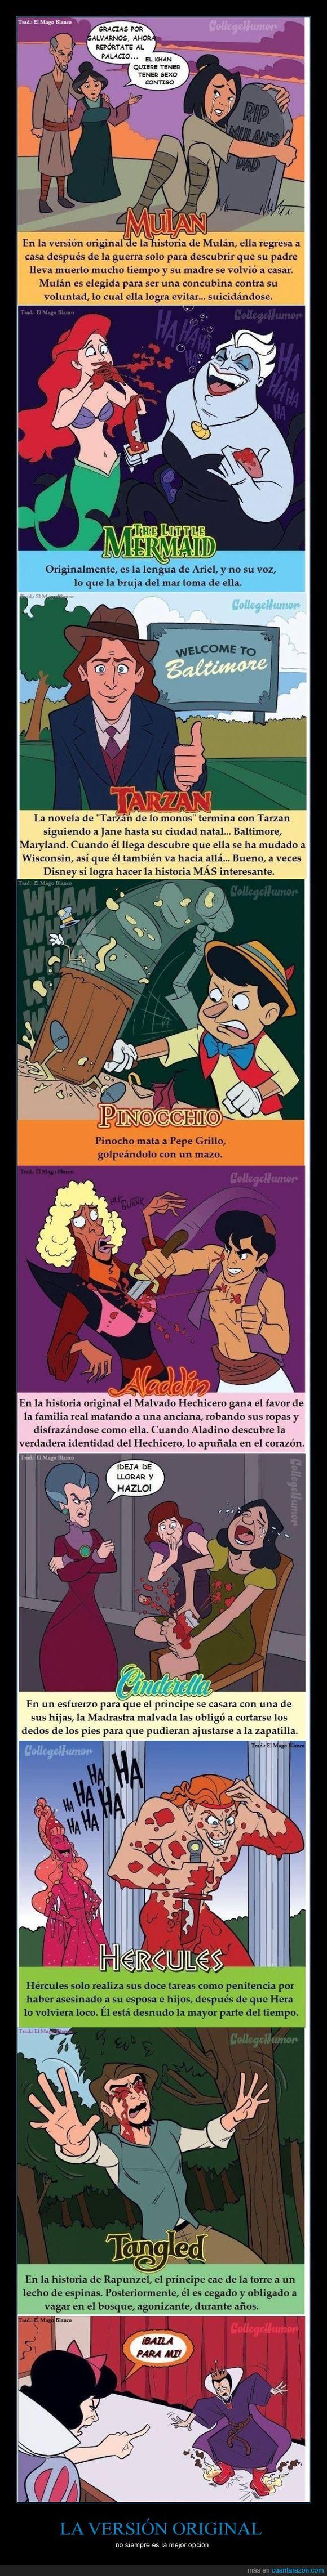 aladdin,Blancanieves,cenicienta,disney,hercules,mulan,peliculas,princesas,real,villanos